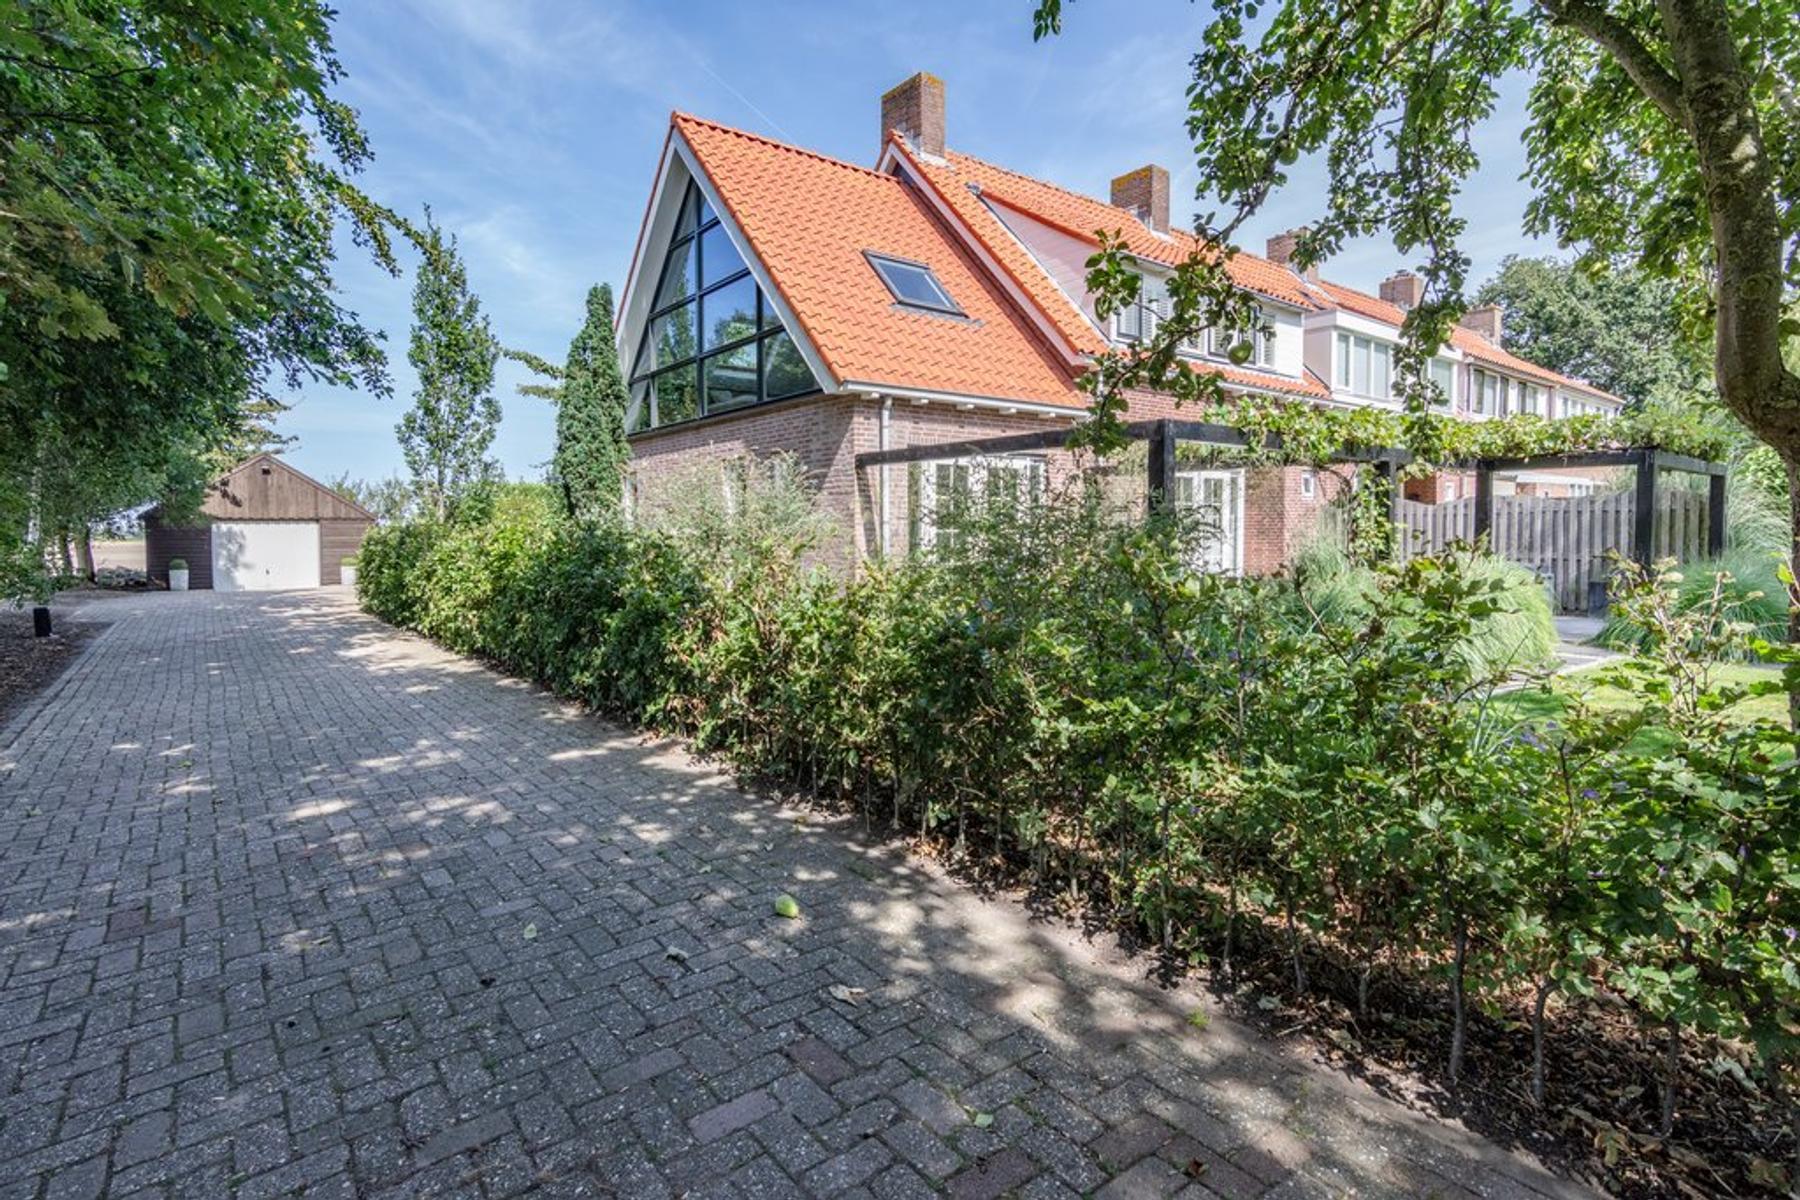 Steenbankpad 12 D in Tollebeek 8309 RC